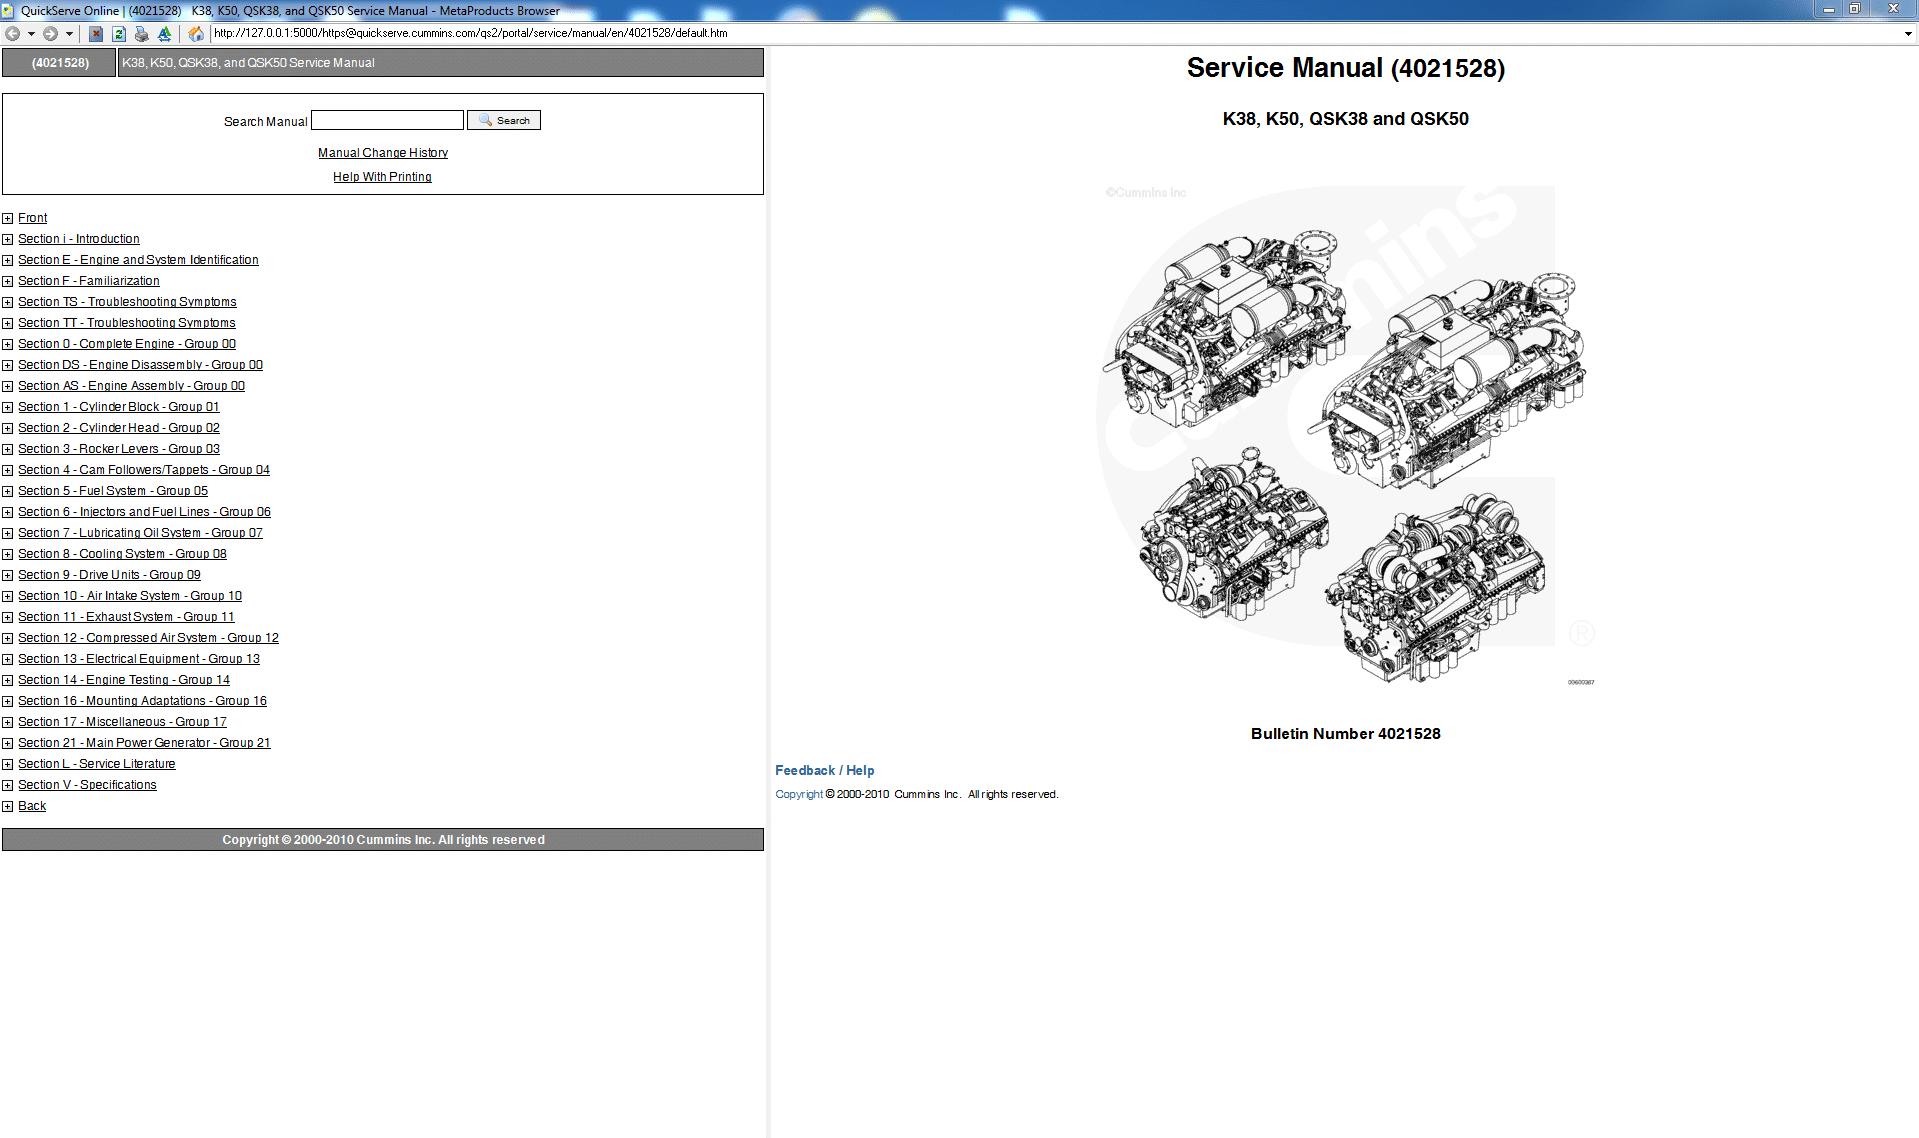 Cummins K38_K50_QSK38_and_QSK50 Service Manual PDF